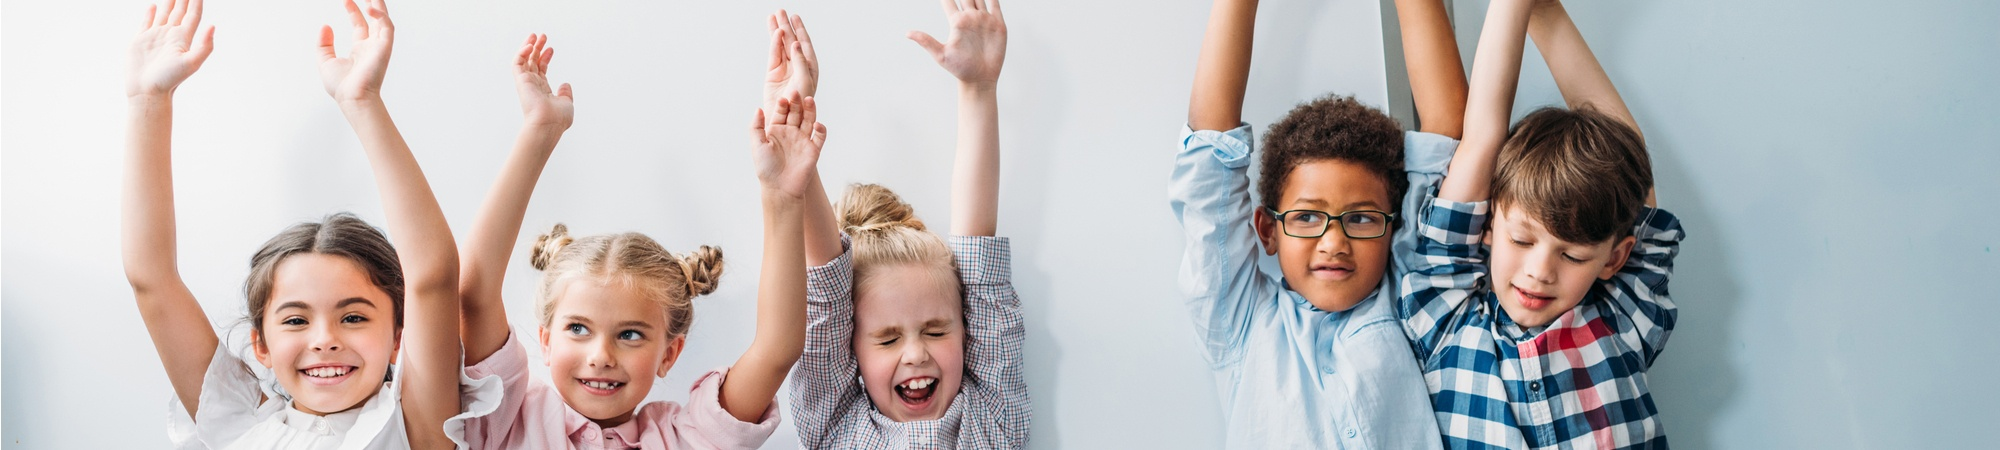 childcare software demo-1.jpg